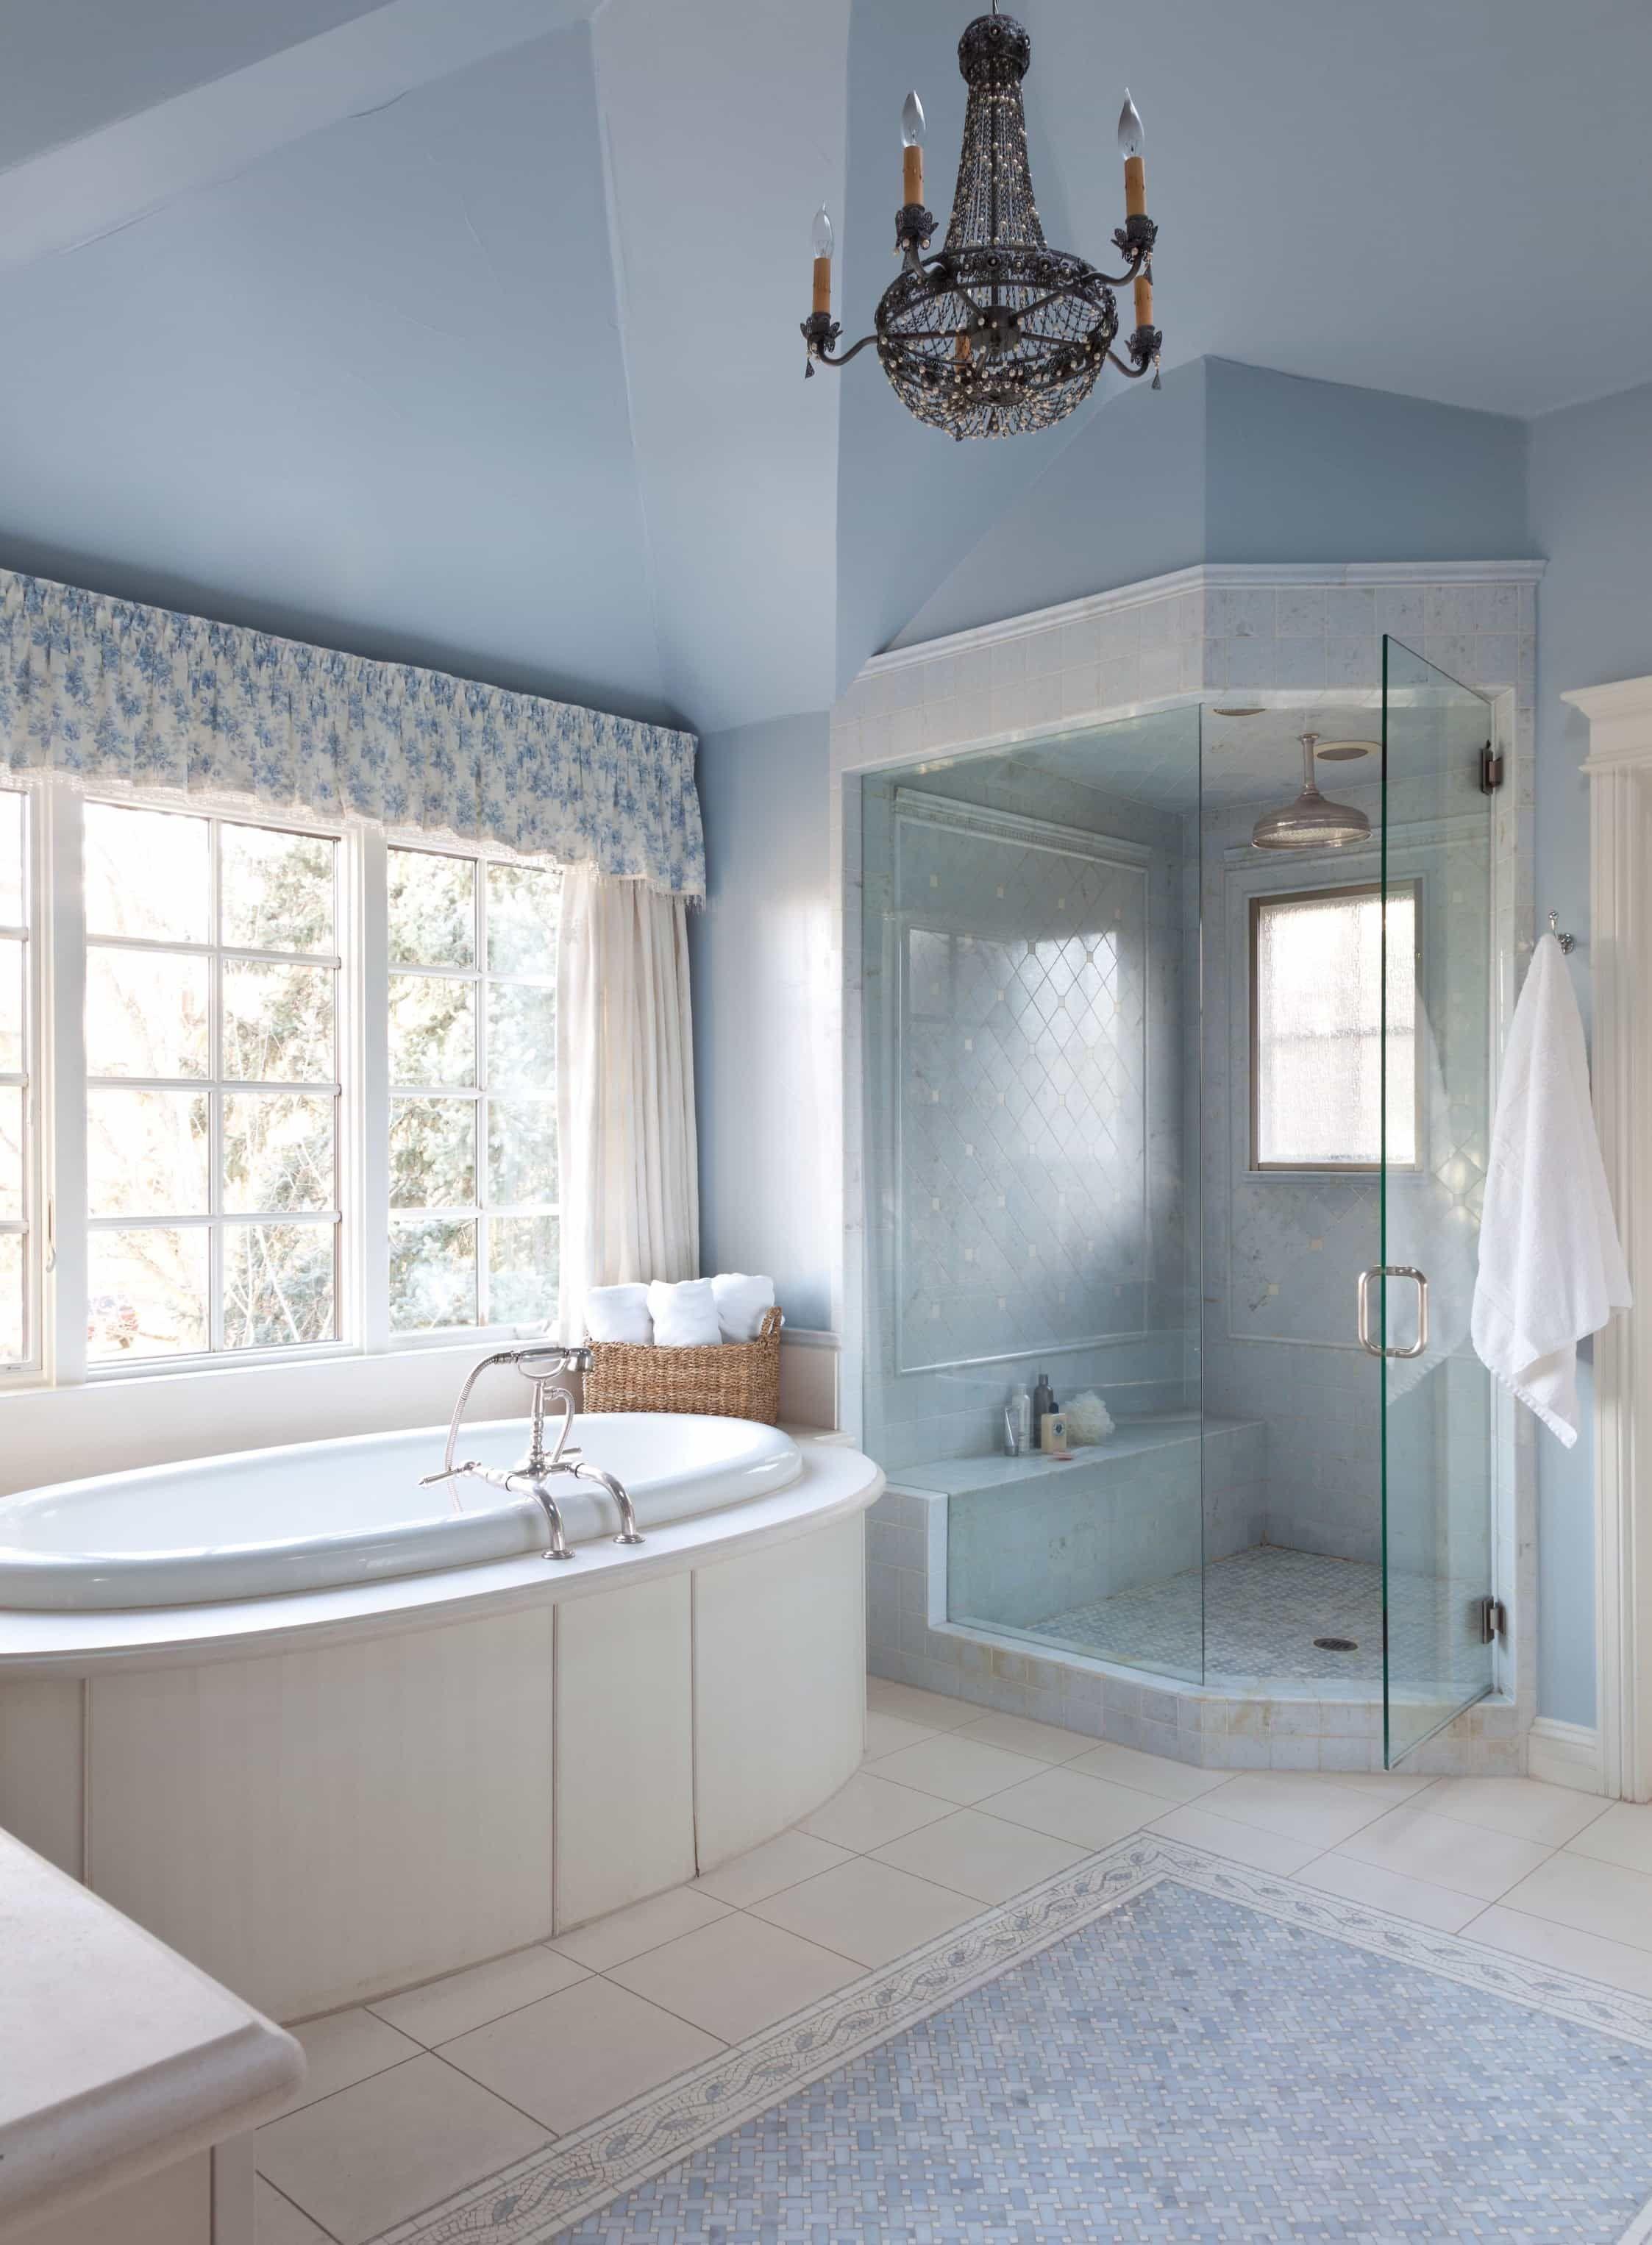 Cottage Style Bathroom Lighting | Cottage style bathrooms, Cottage ...